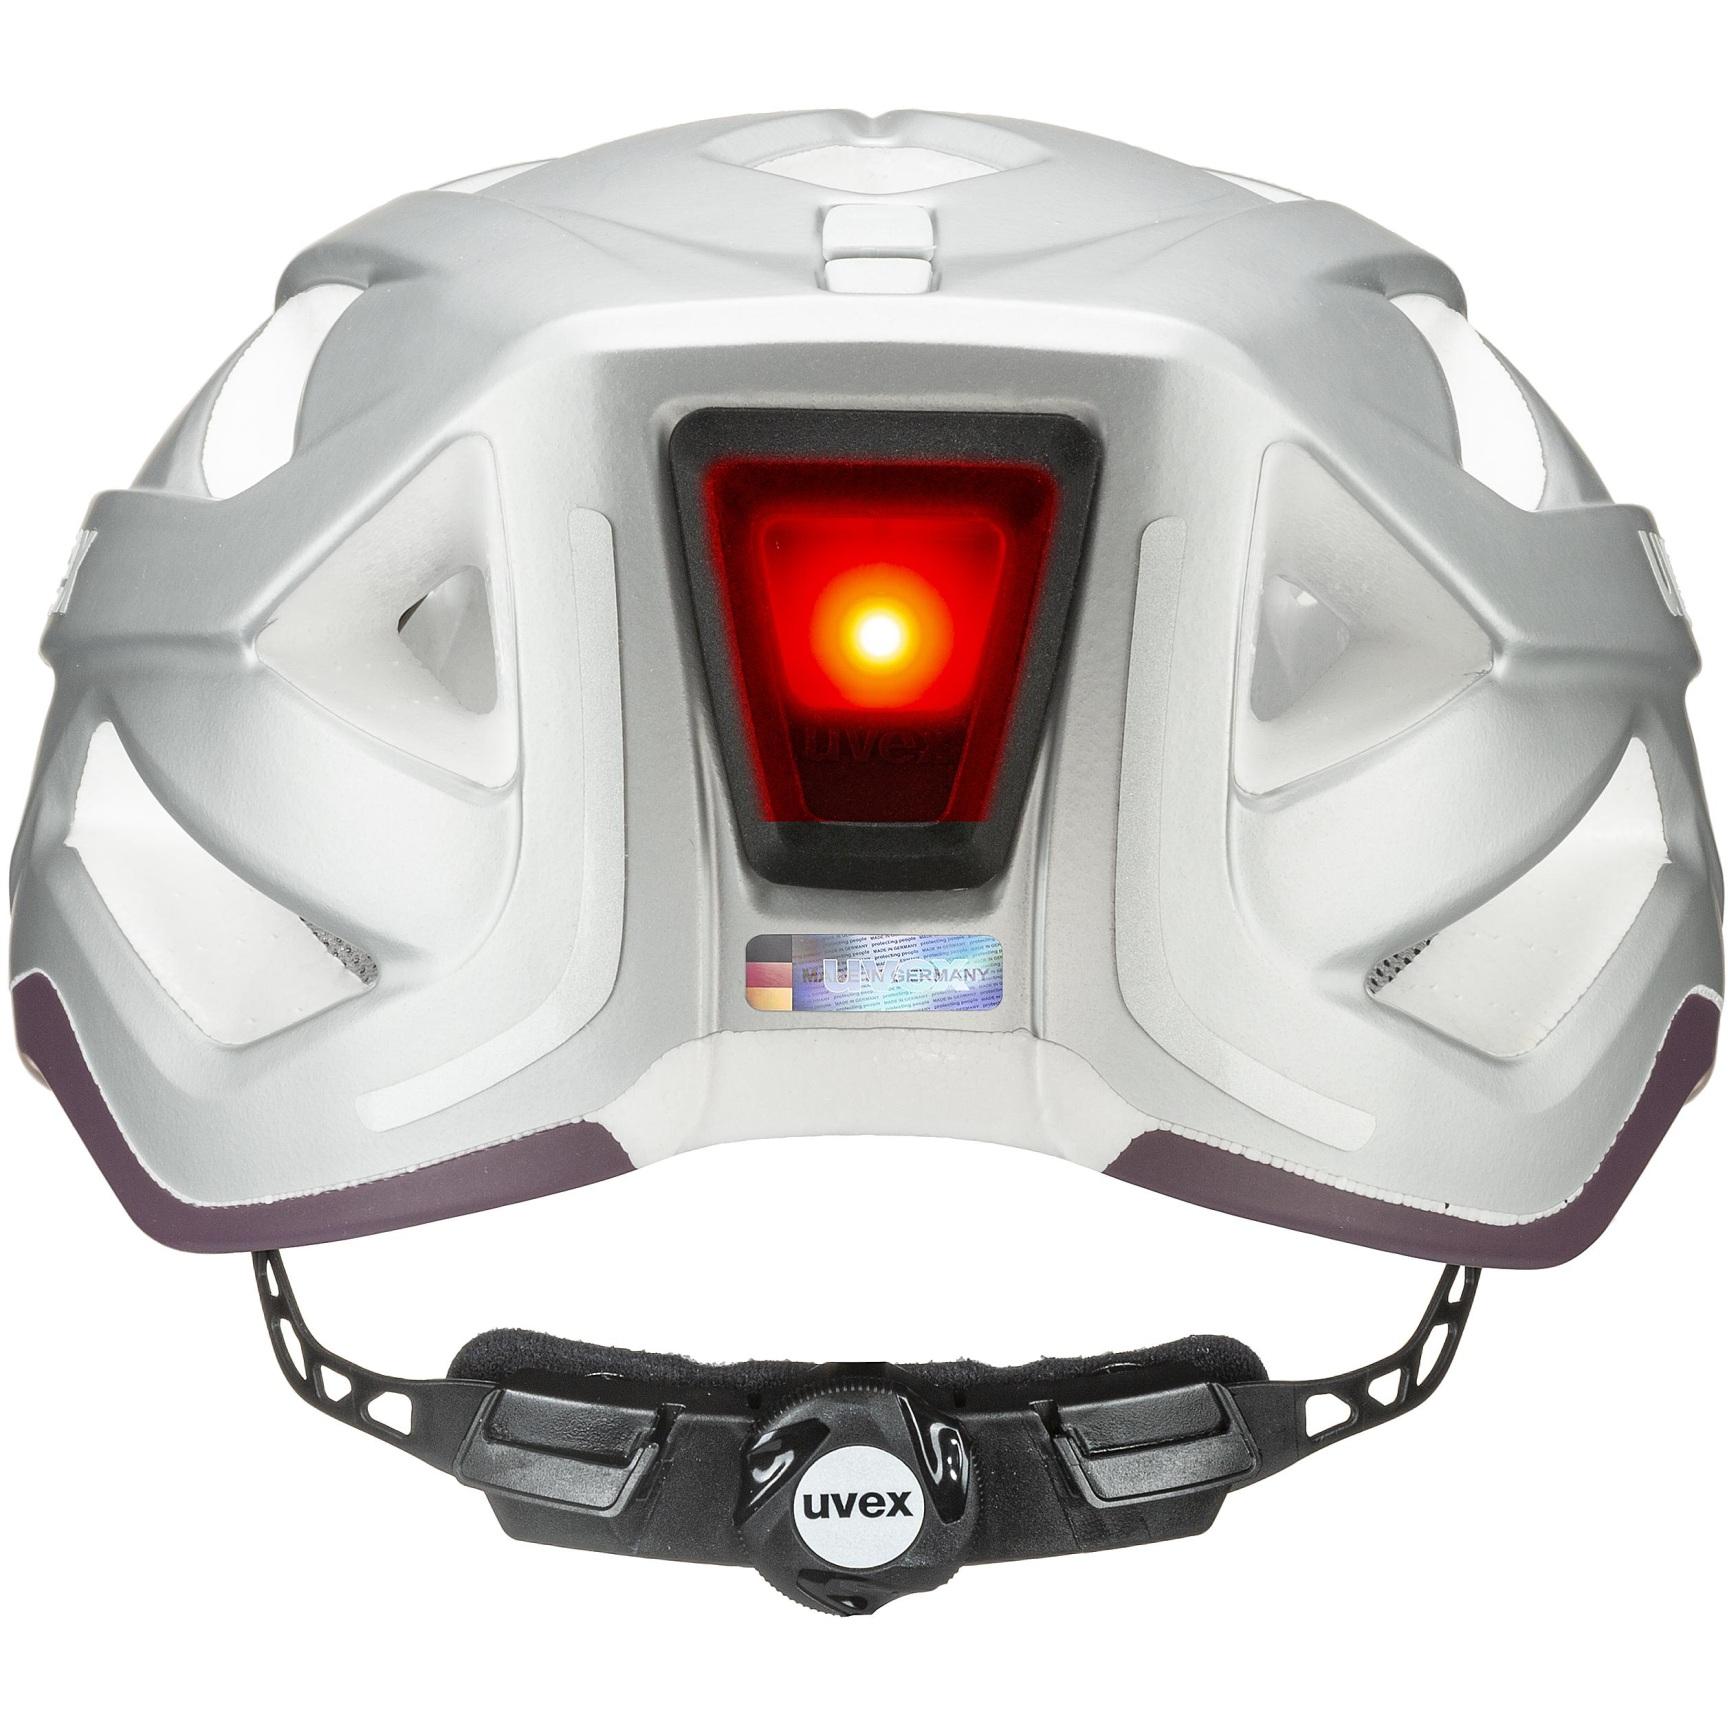 Image of Uvex city active Helmet - silver plum mat